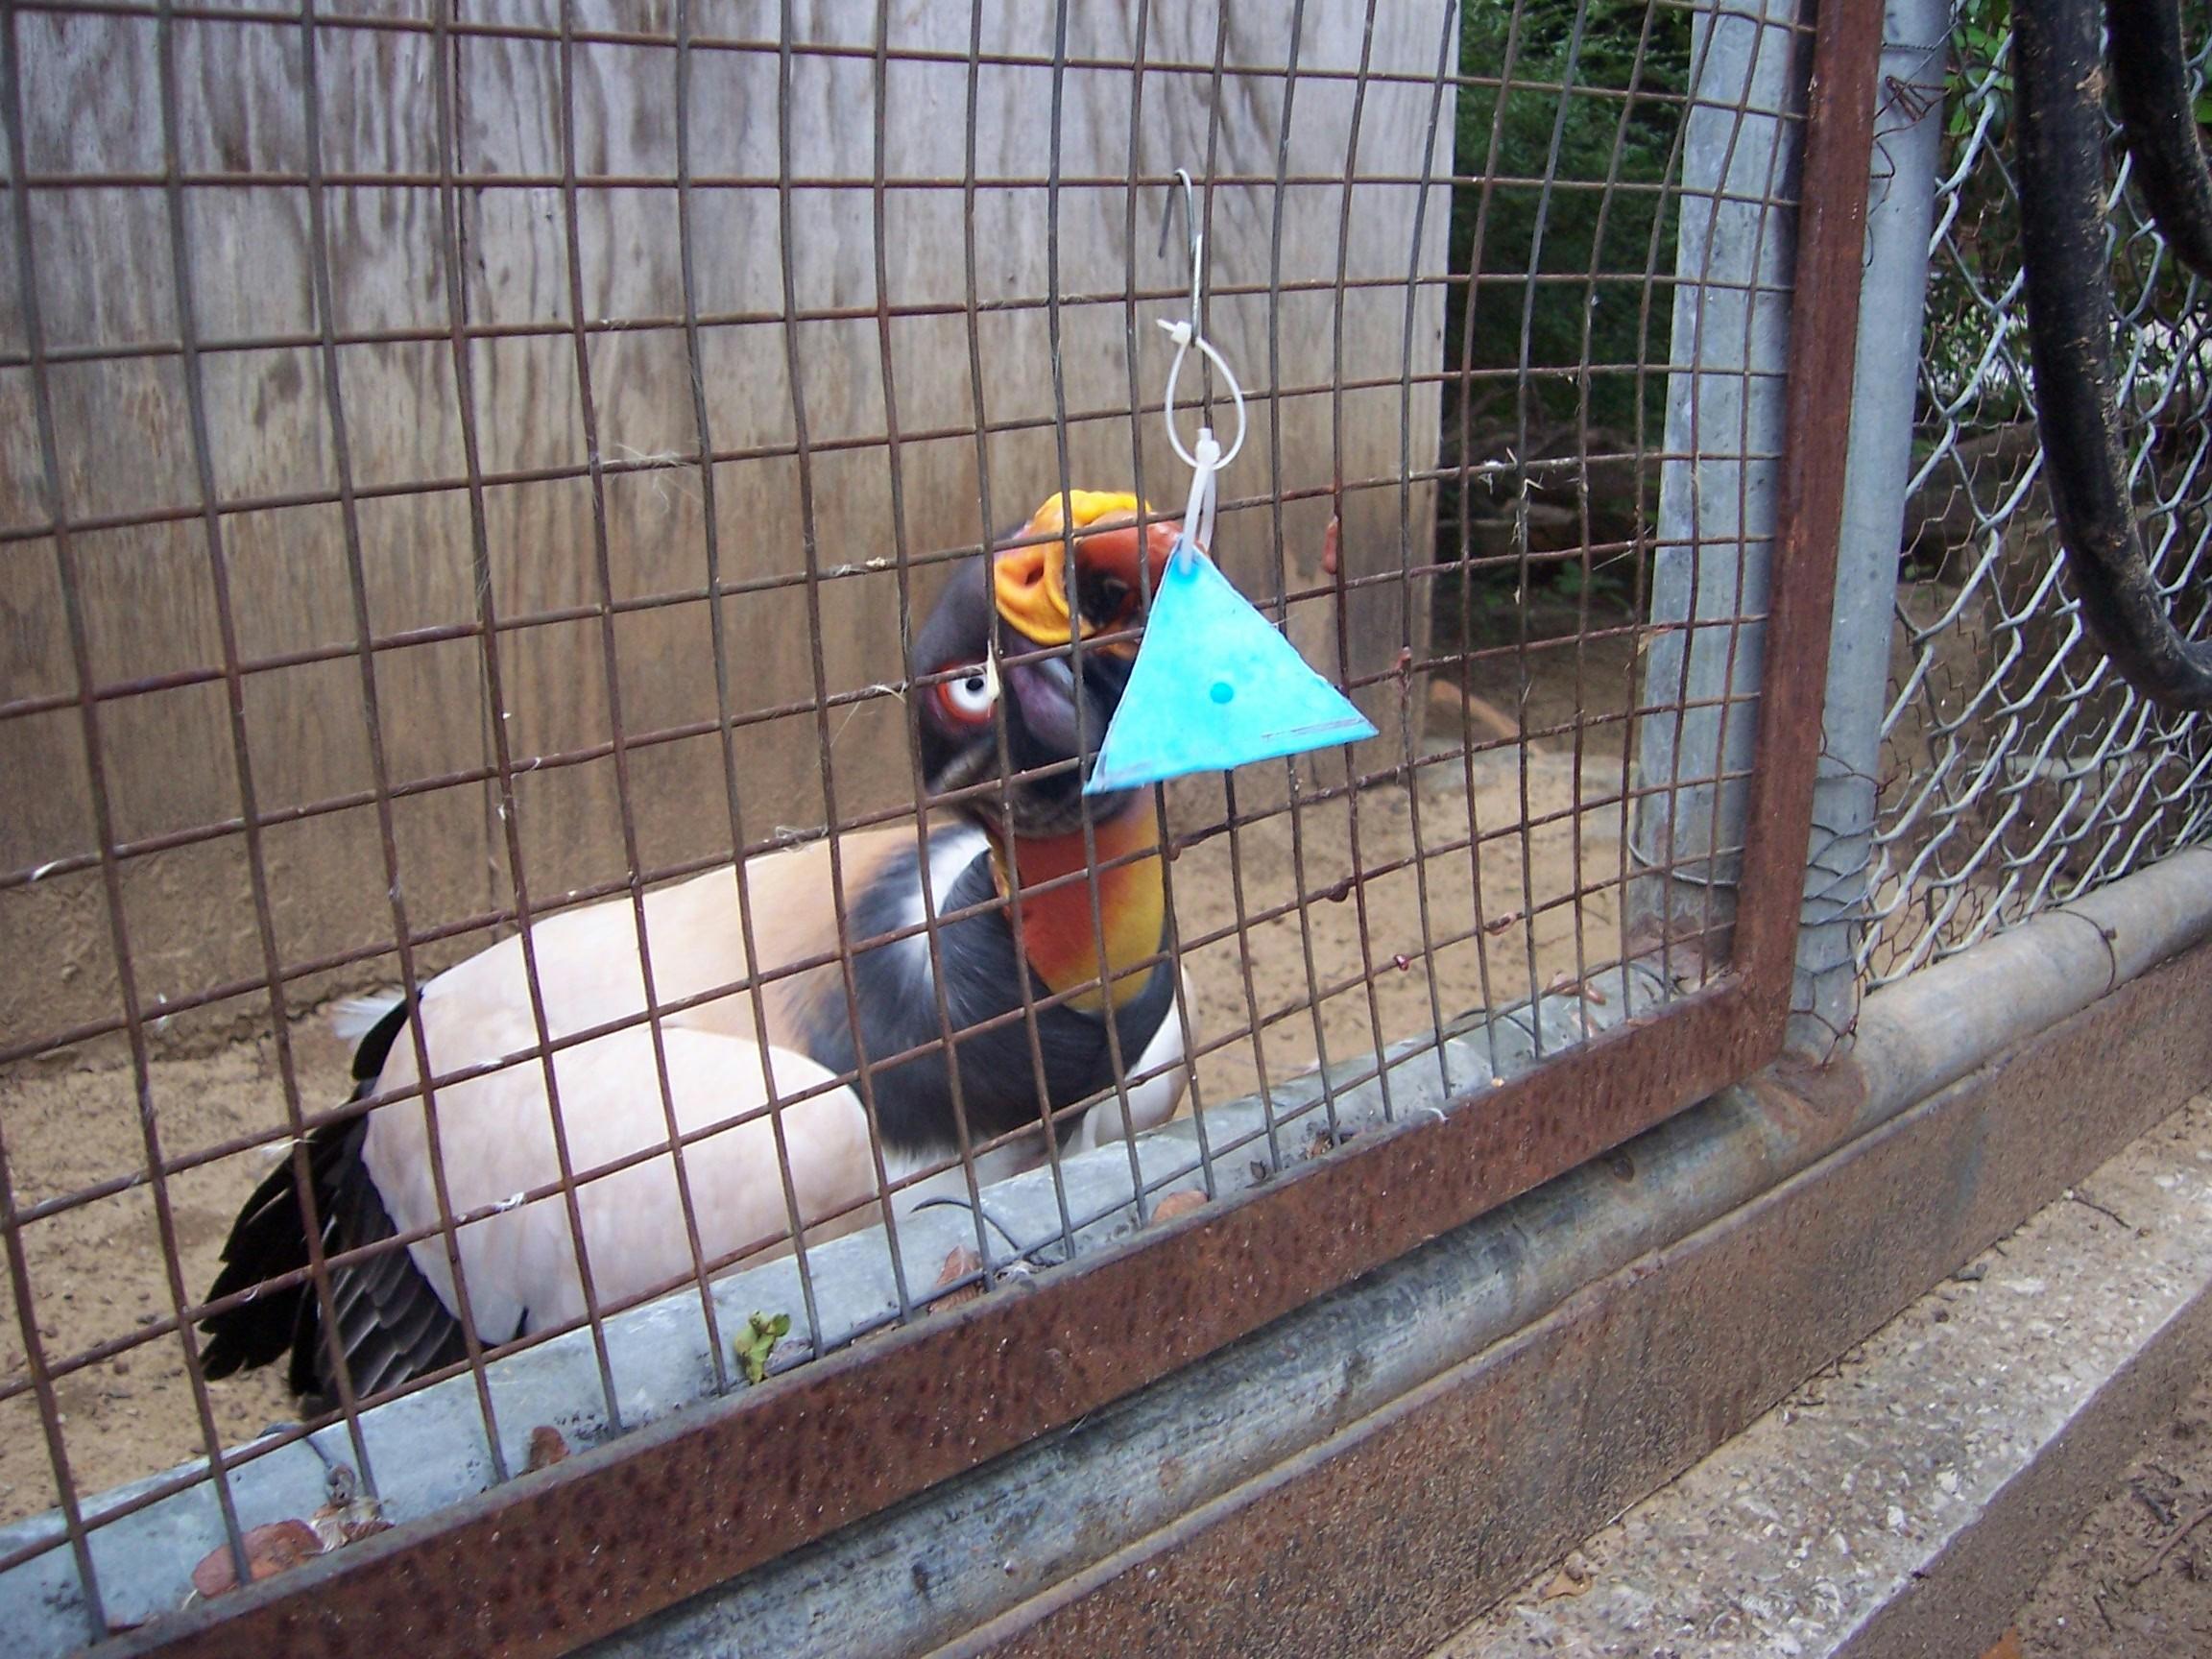 vultureson target